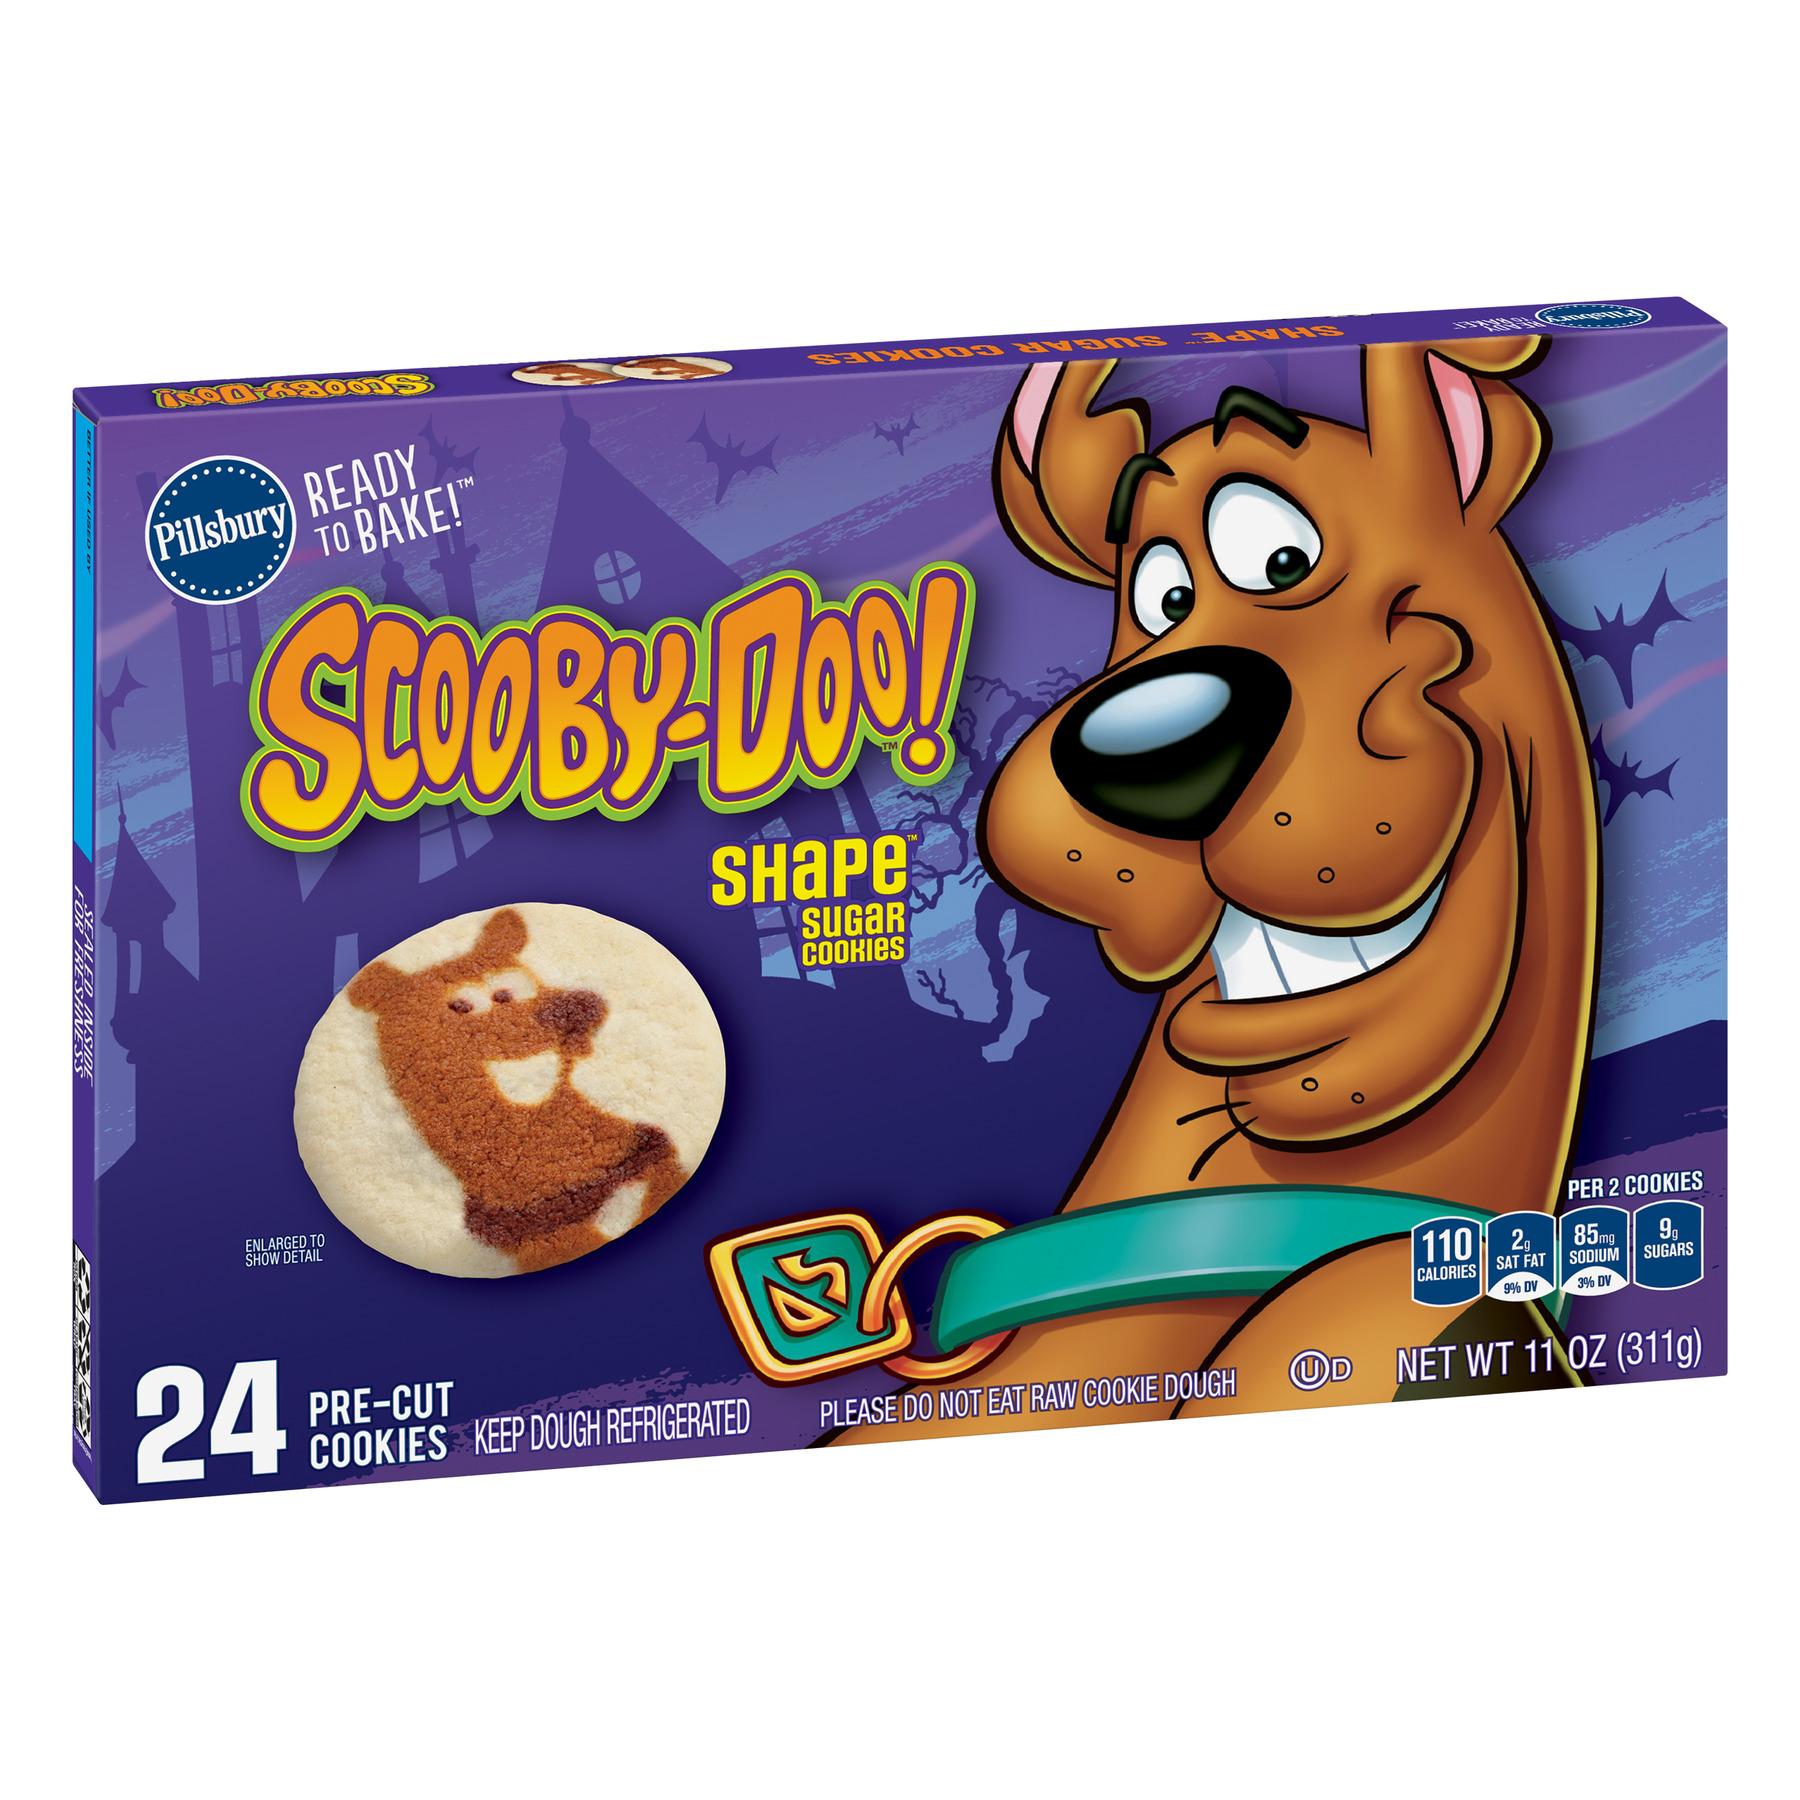 Pillsbury Ready to Bake! Scooby-Doo! Shape Sugar Cookie Dough, 11 Oz., 24 Count